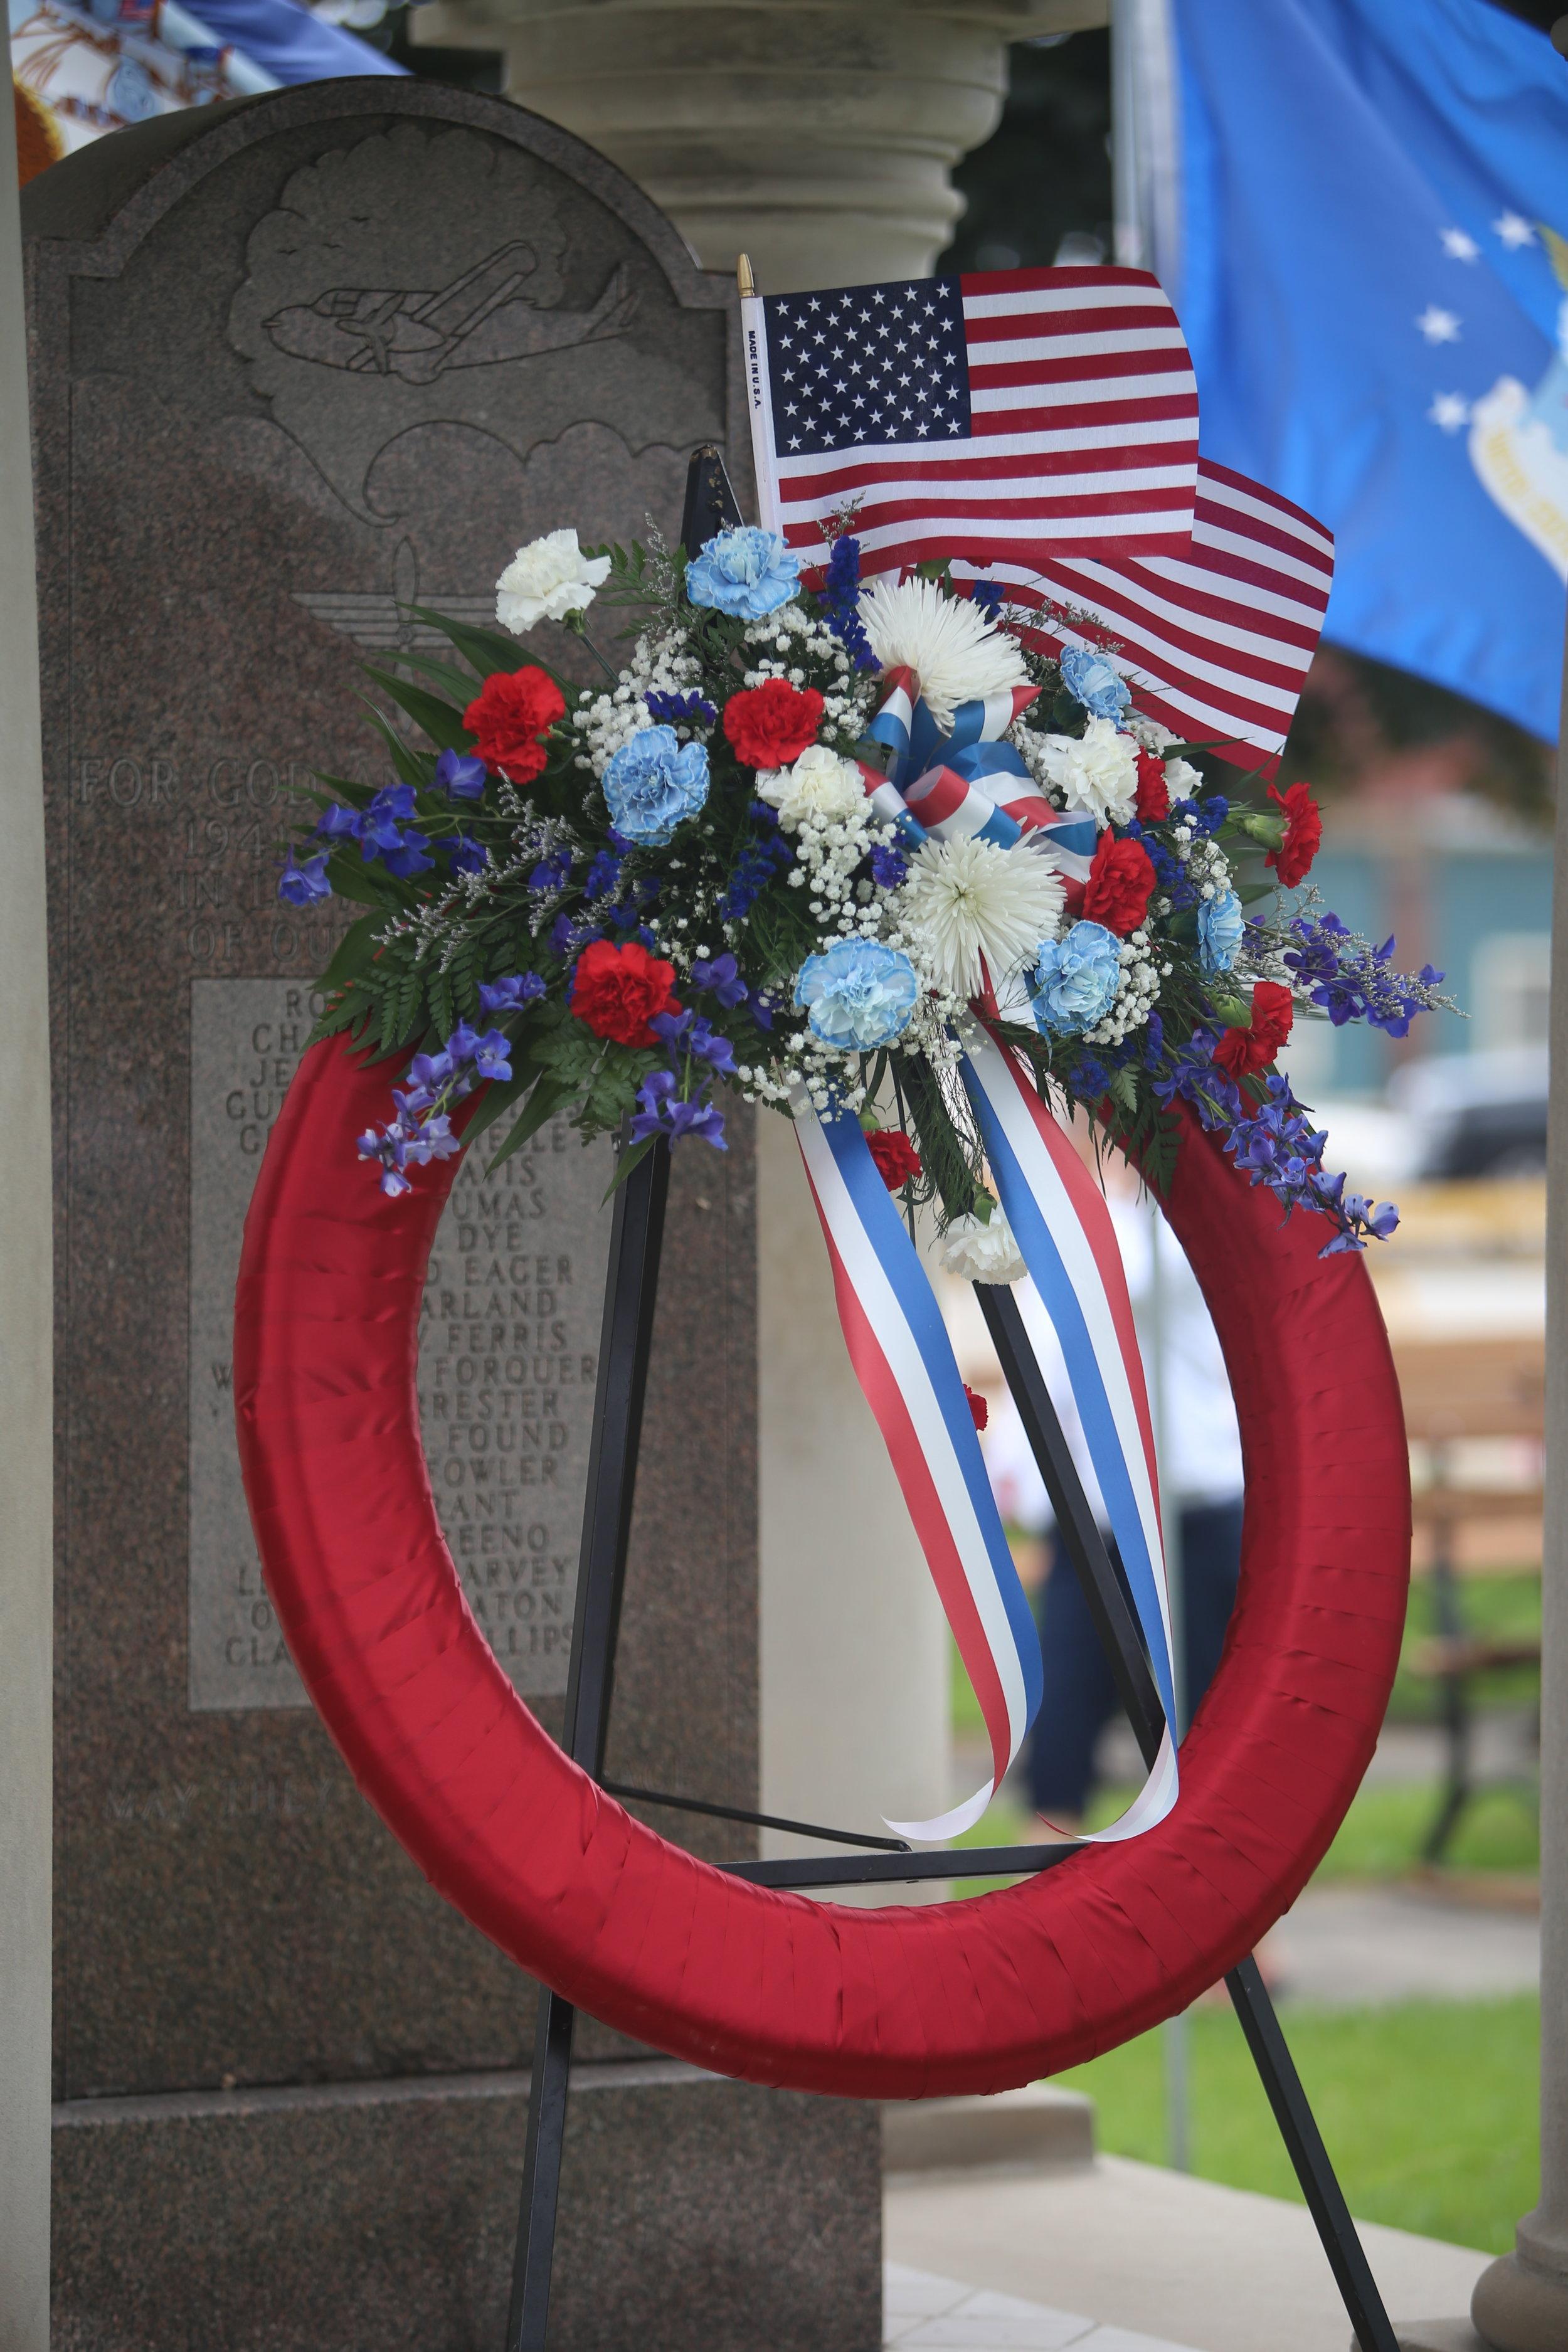 Scotland County World War II Memorial, Memphis, Missouri